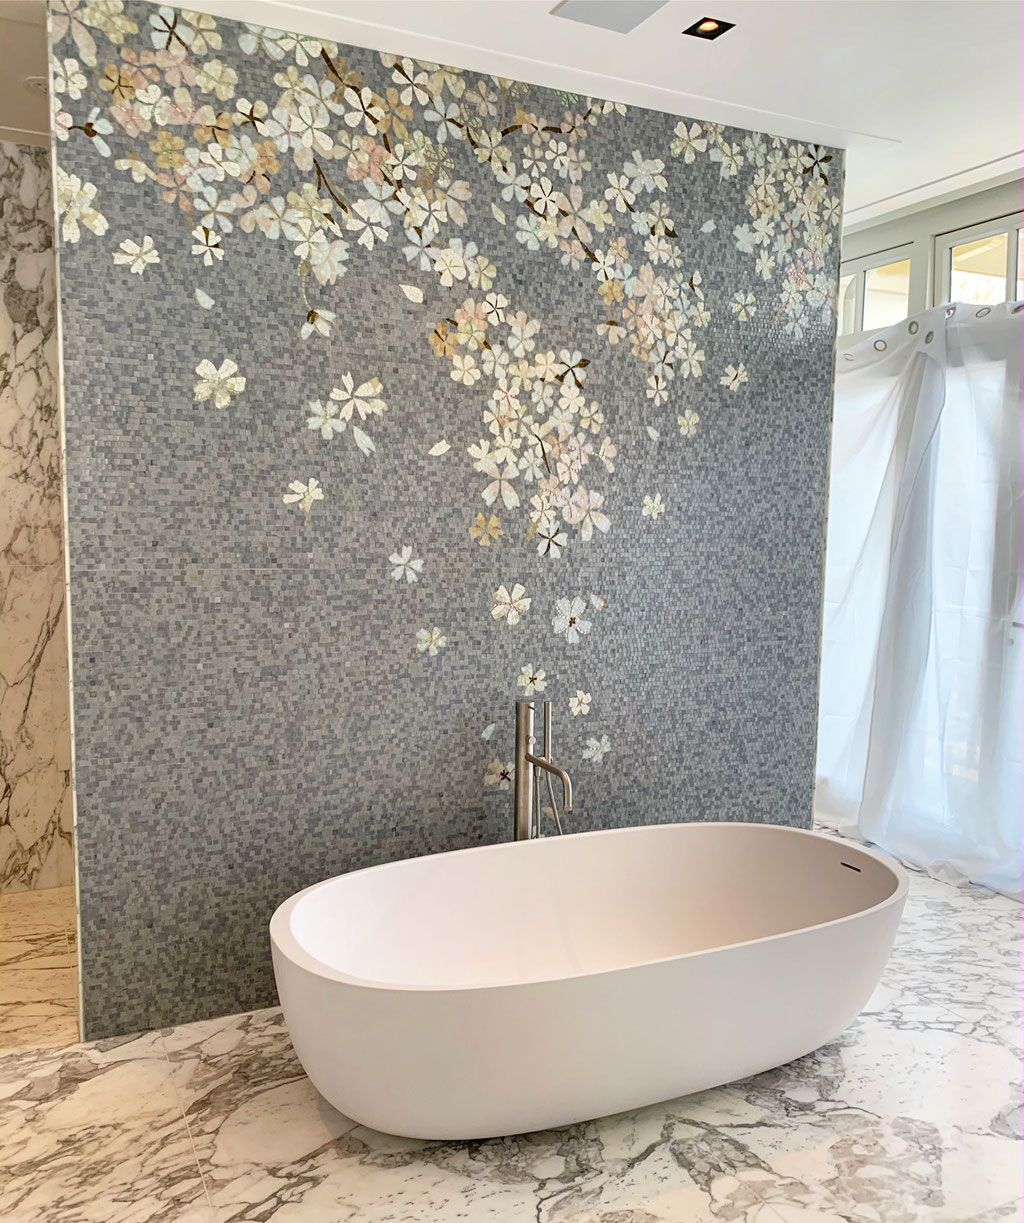 Calacatta marble with glass mosaic bathroom